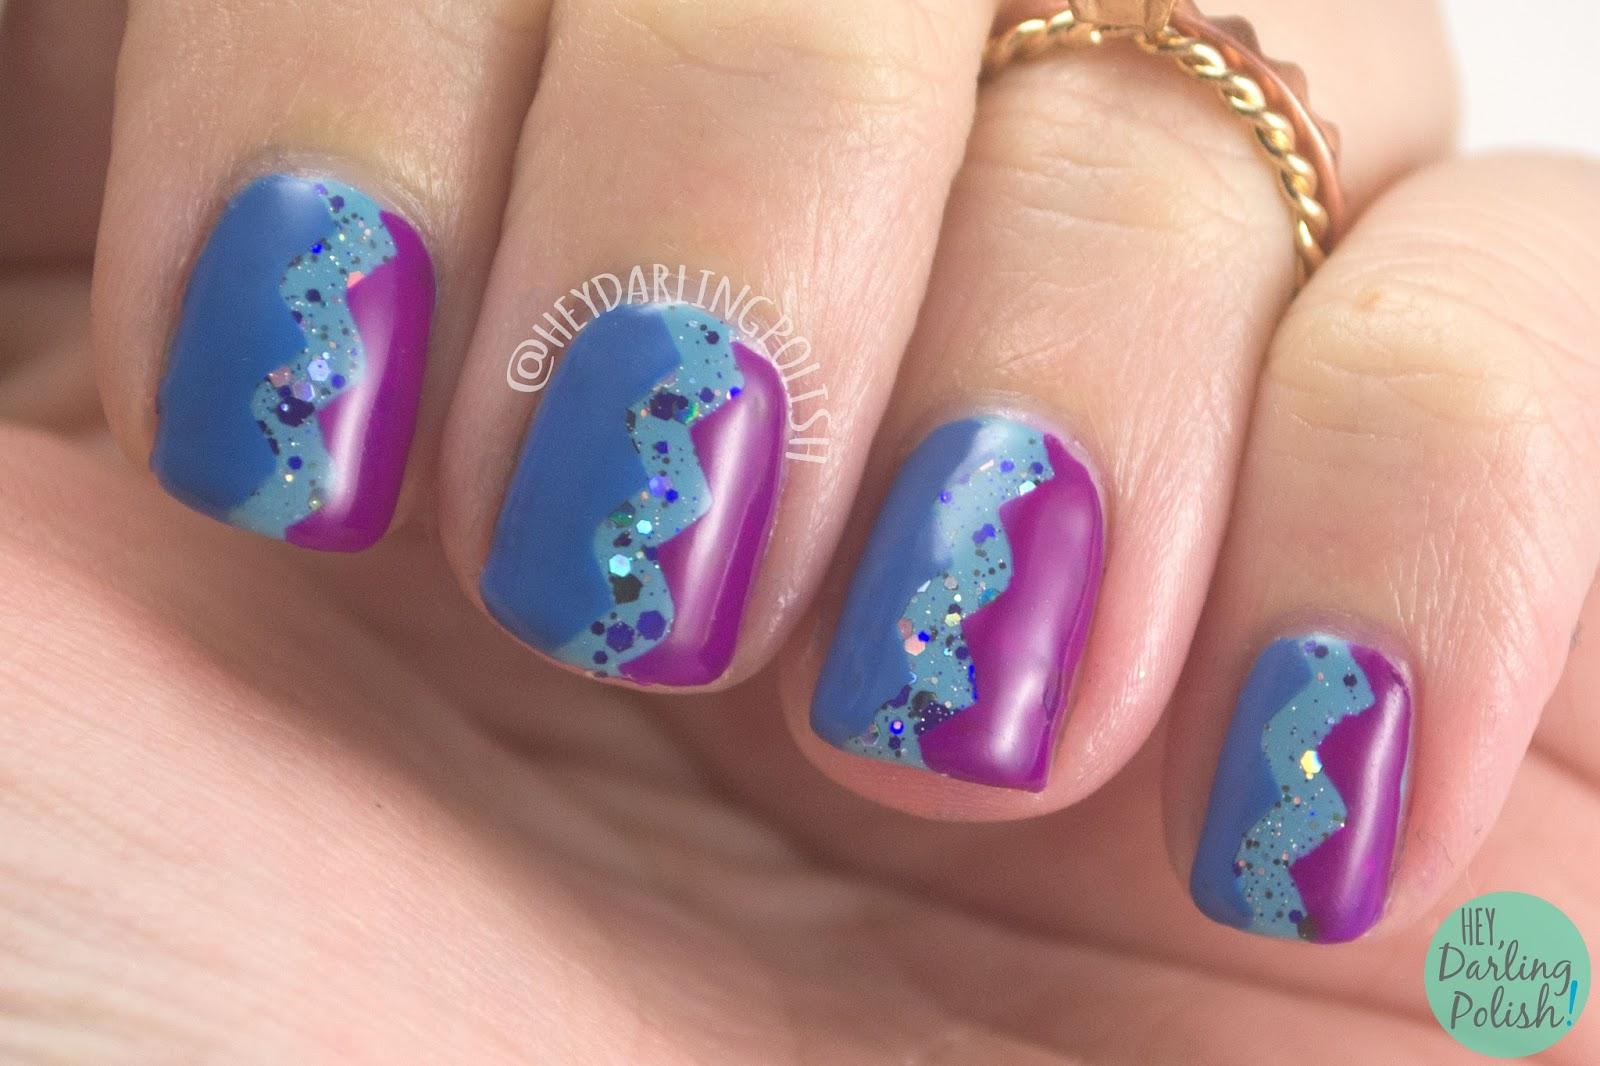 nails, nail art, nail polish, zig zags, purple, blue, hey darling polish, 52 week challenge, zoya, pipe dream polish, indie polish, 52 week challenge